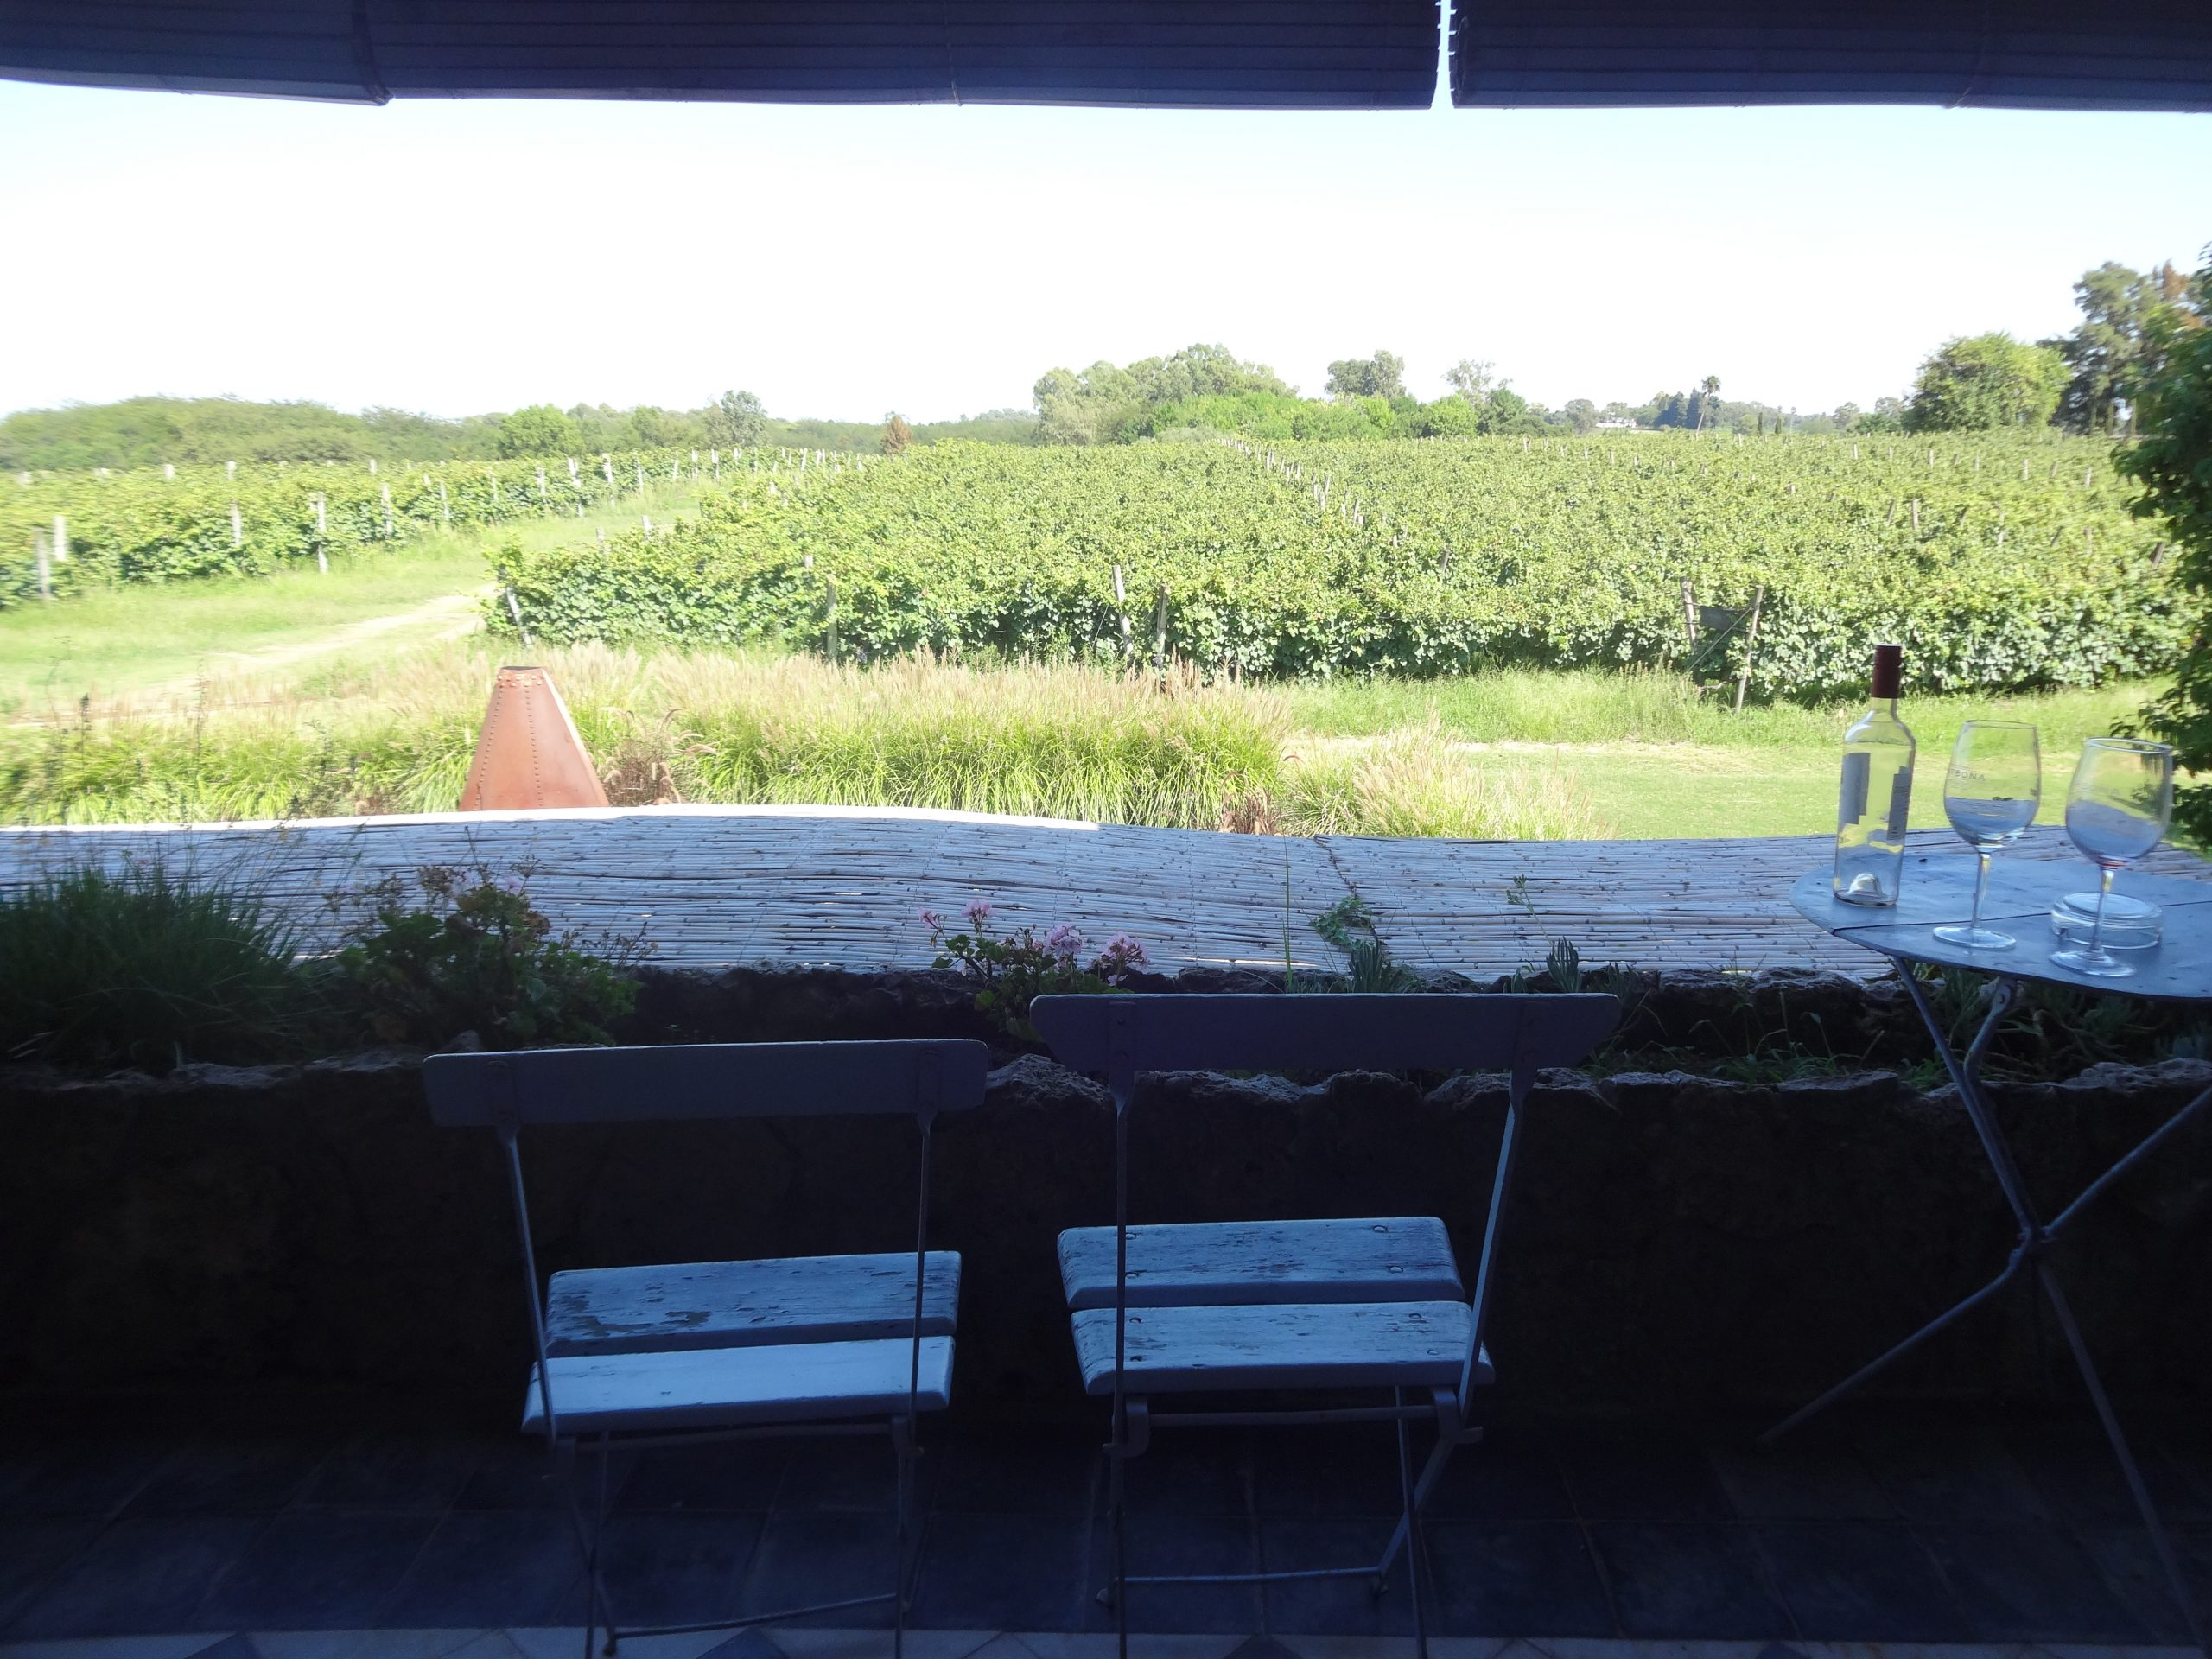 narbona-terraco-vinhos